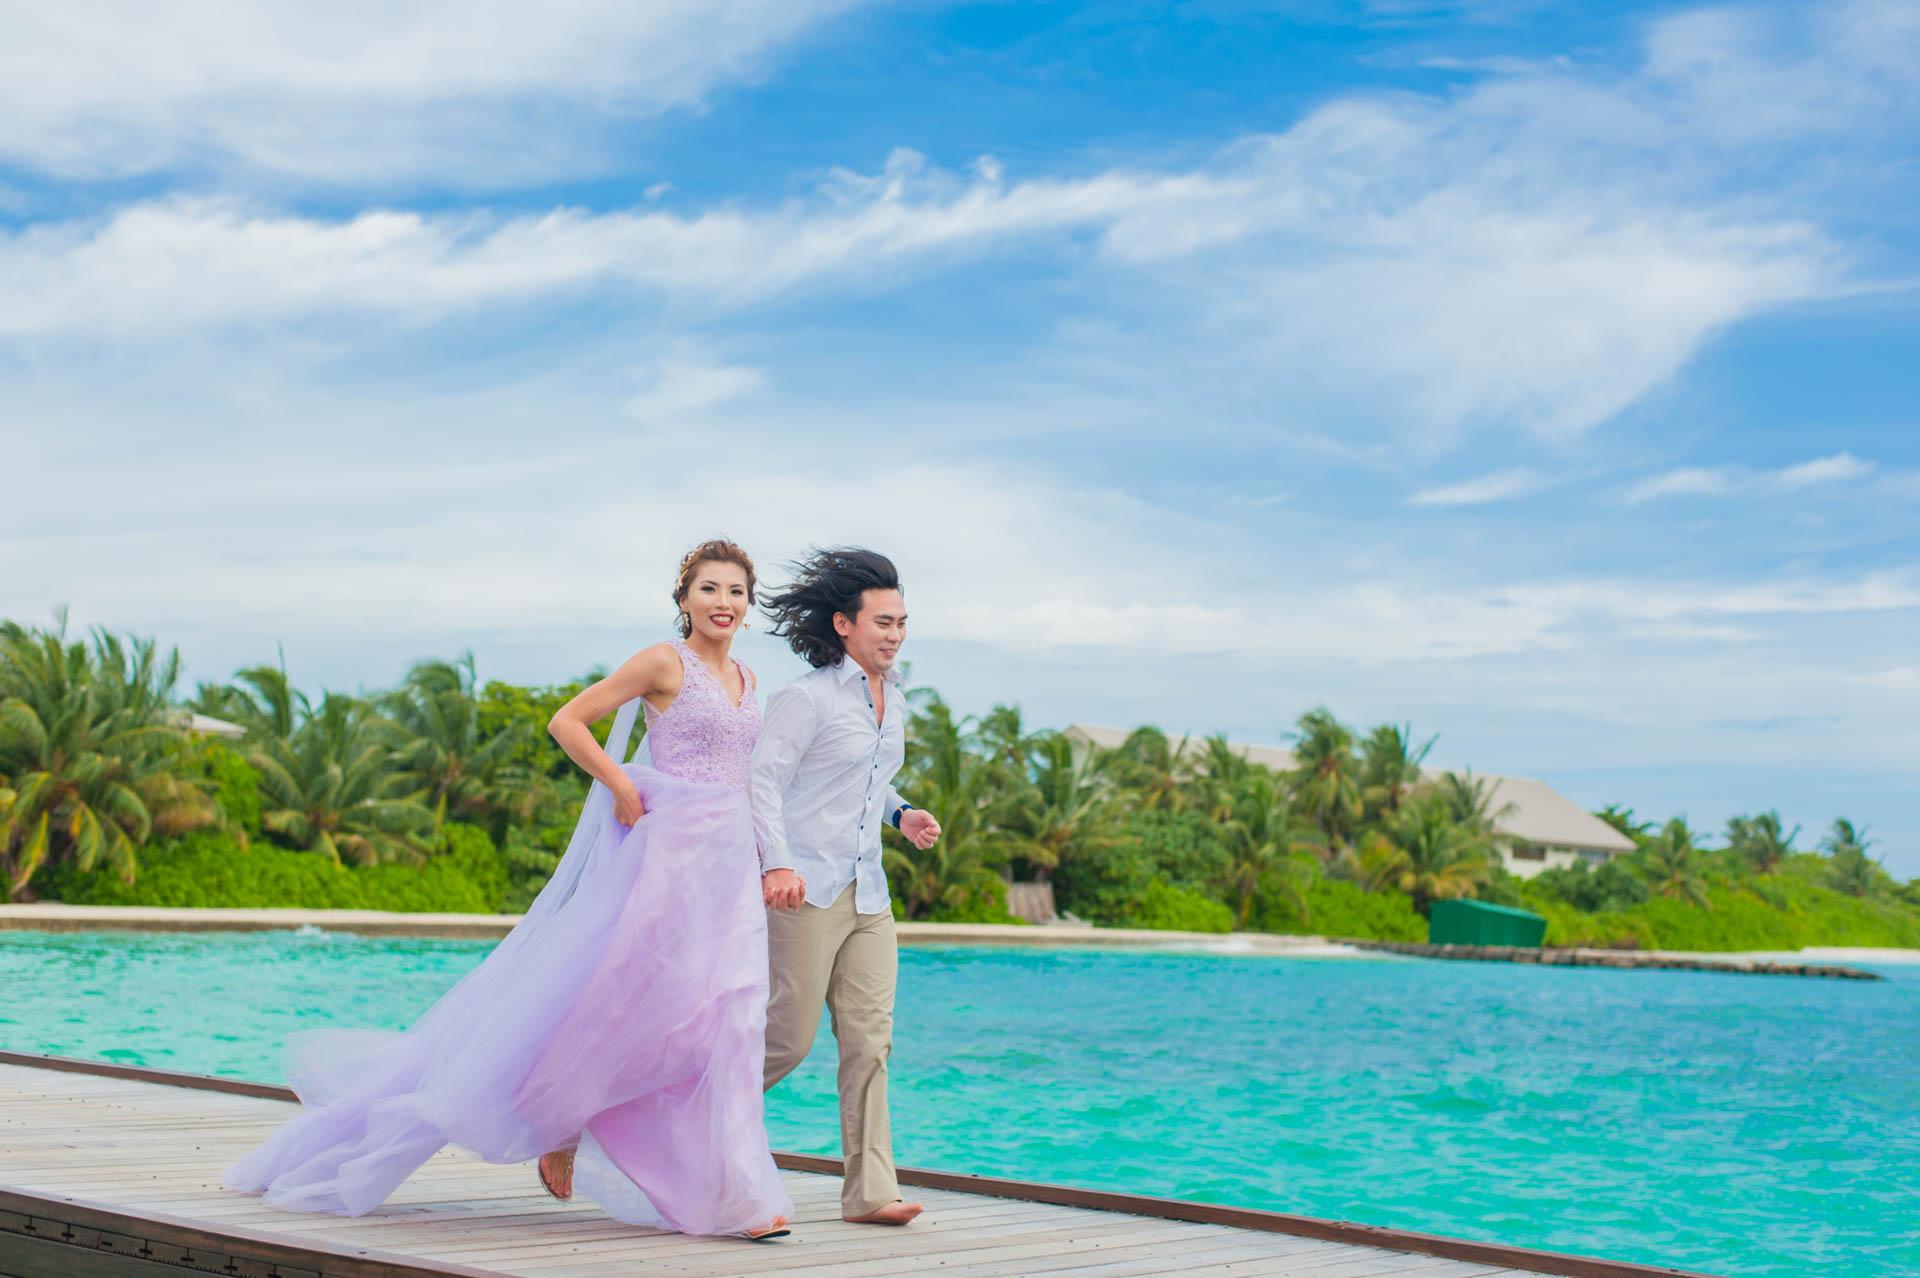 Chih Chao Yu Shan Destination Wedding at Residence Maldives 50